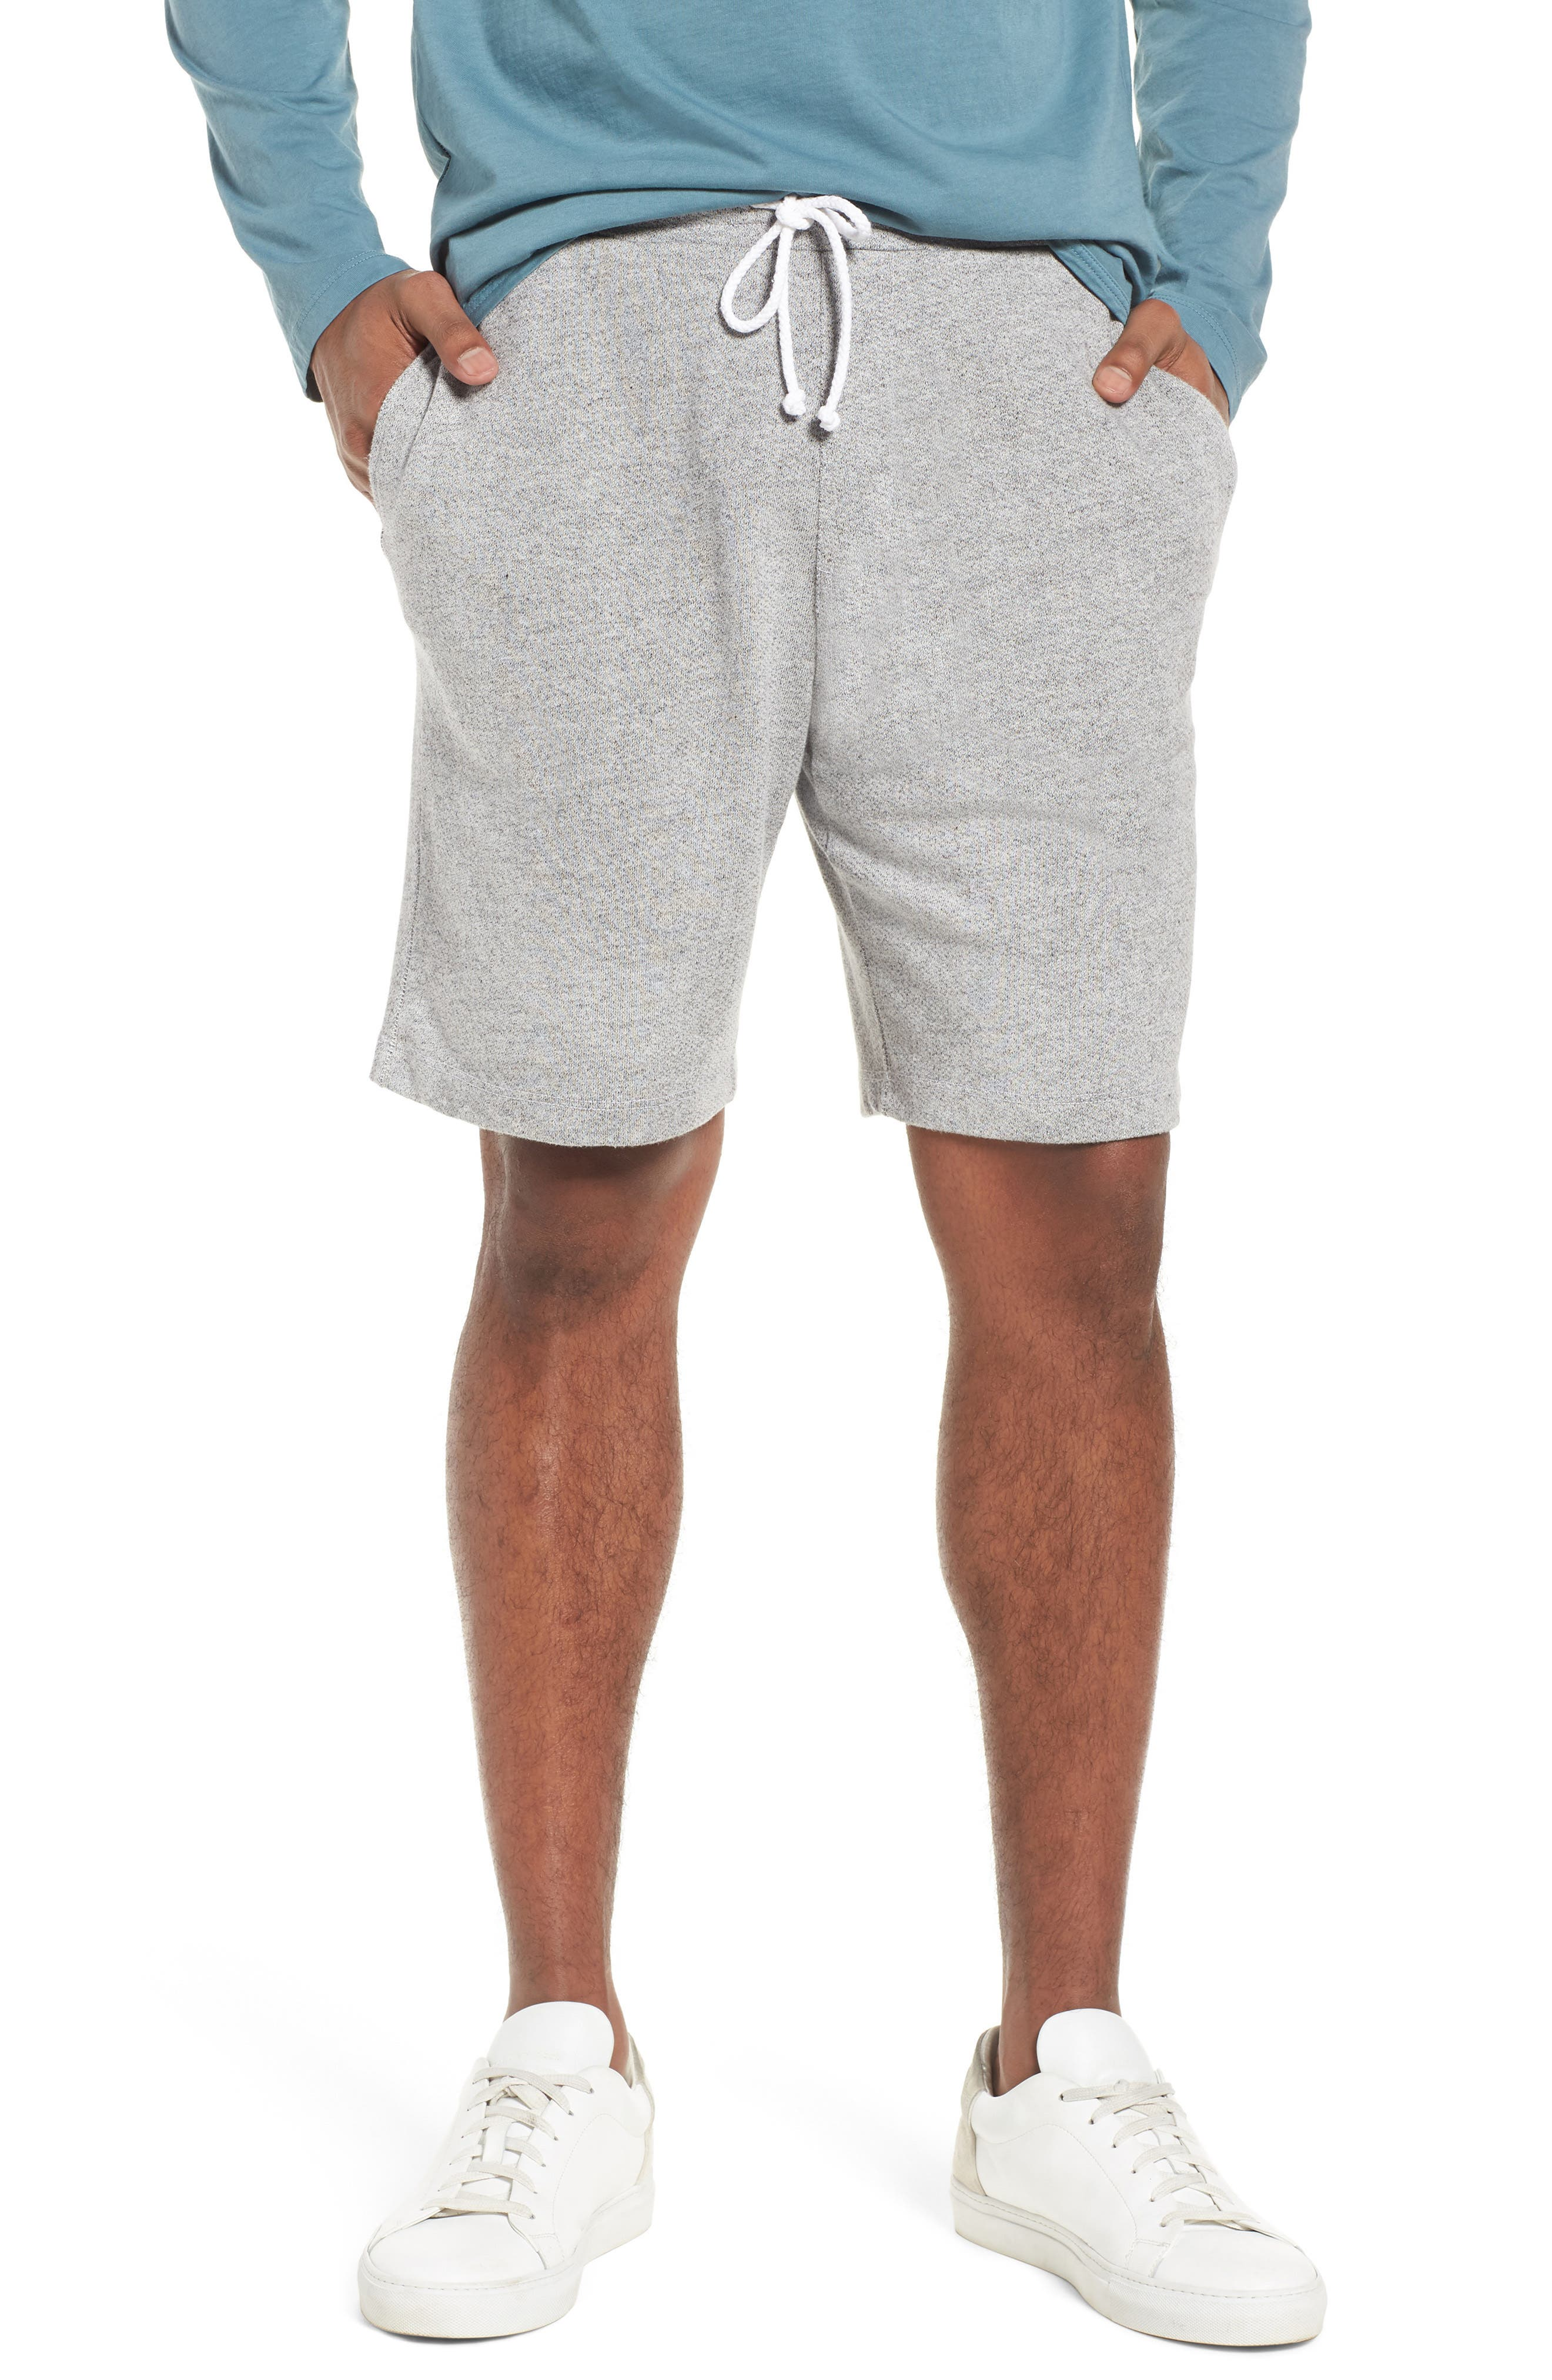 Men's Clothing Shorts Bar Iii 3 Soft Rose Pink Large 34 36 Draw String Athletic Lounge Sweat Shorts